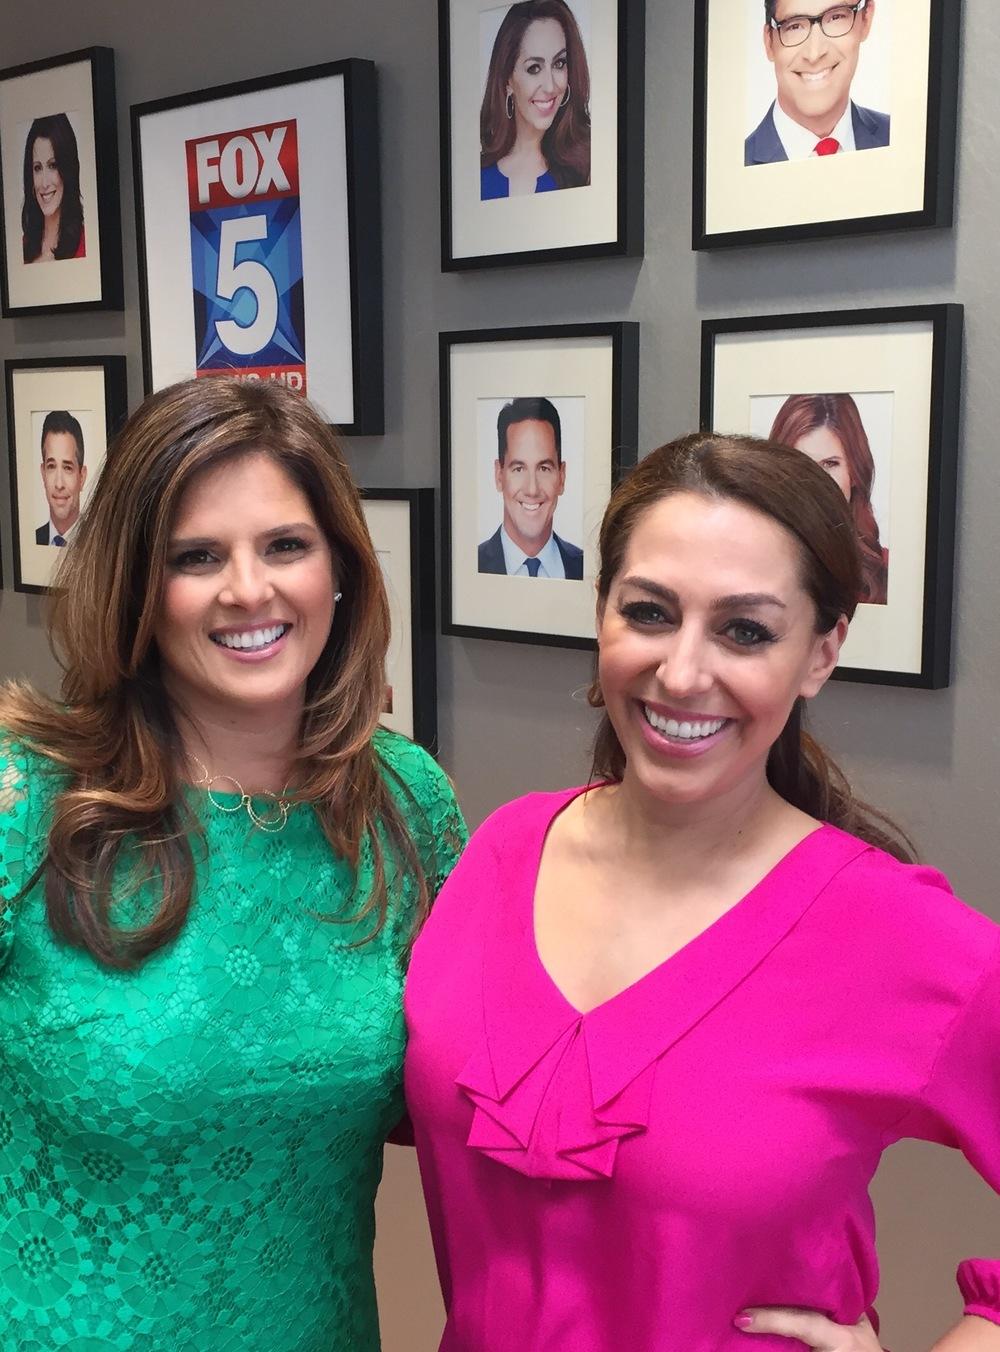 Luxe Specialist Rosalena Huarcaya with Shally Zomorodi of Fox 5 morning news